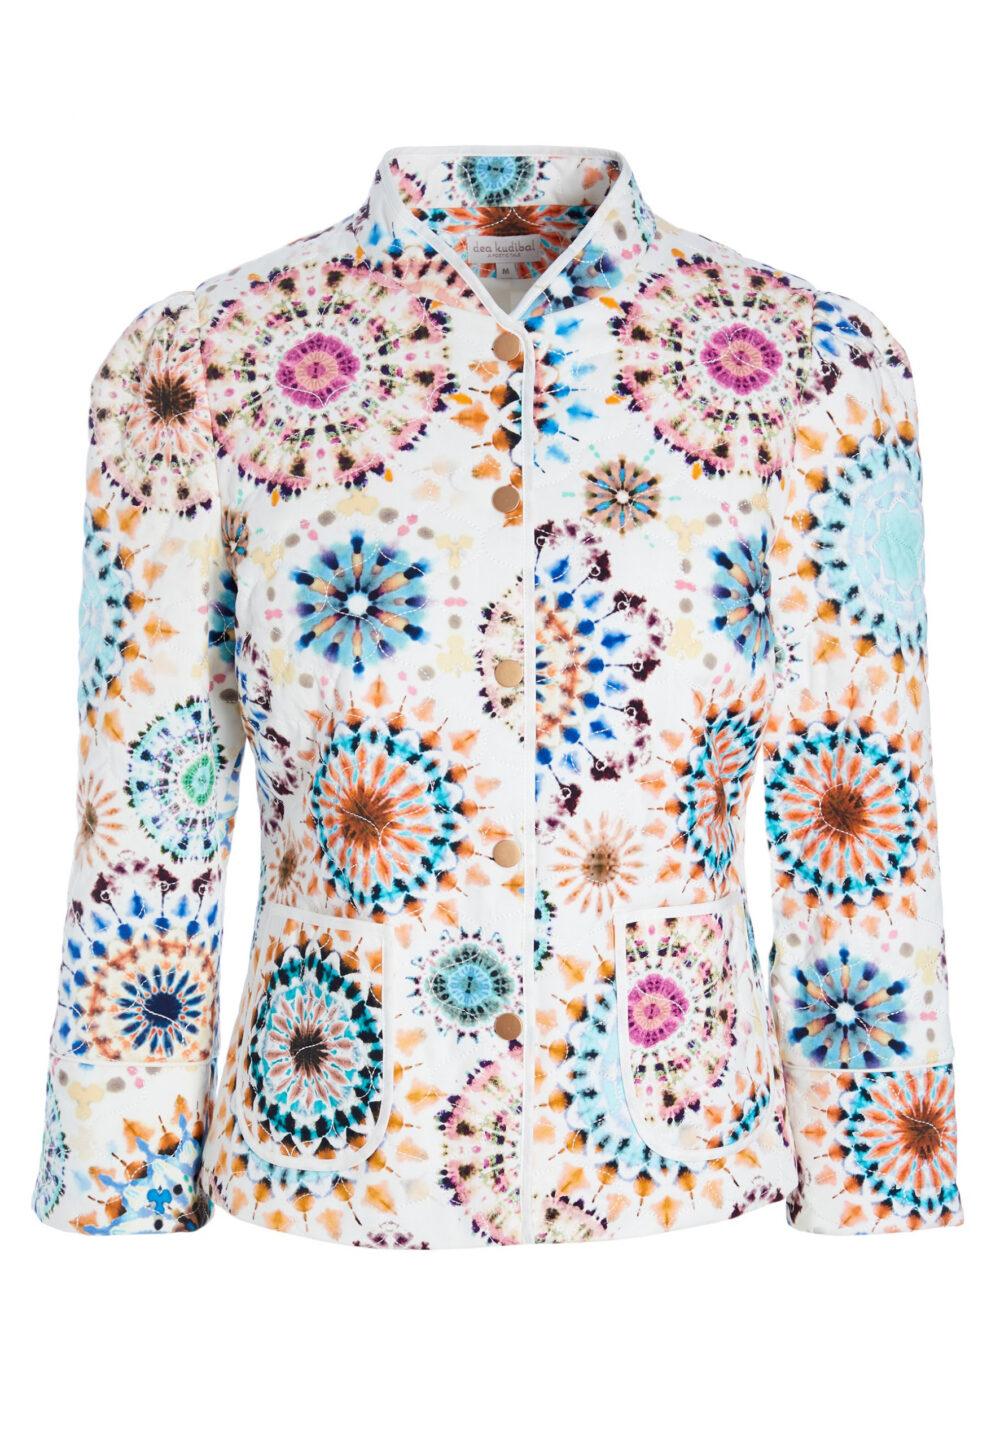 Dea Kudibal quilted jakke Rosy Kaleidoscope scaled